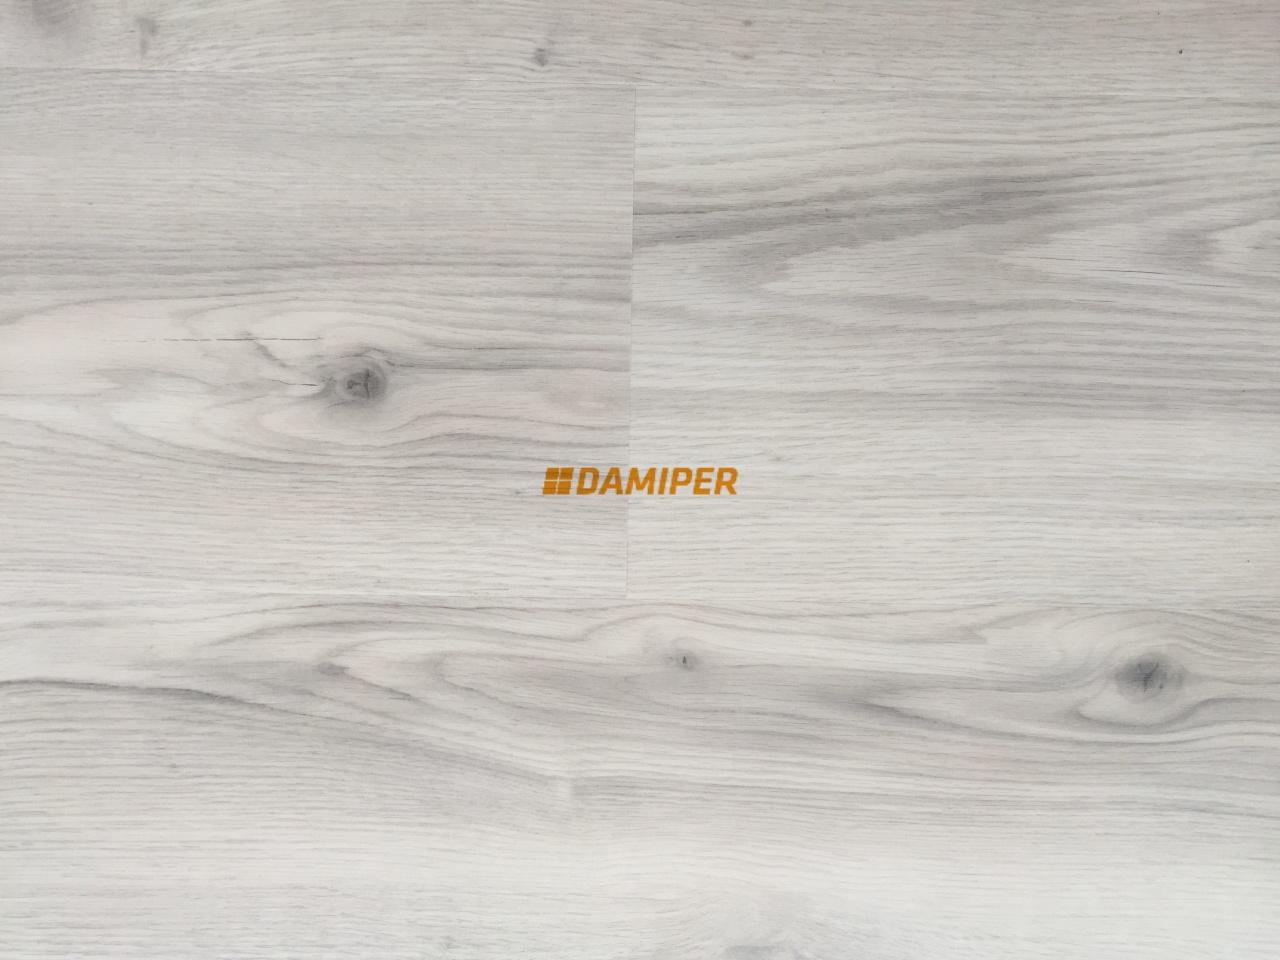 kompozitne_podlahy_egger_greentec_ehd022_dub_timbara_damiper